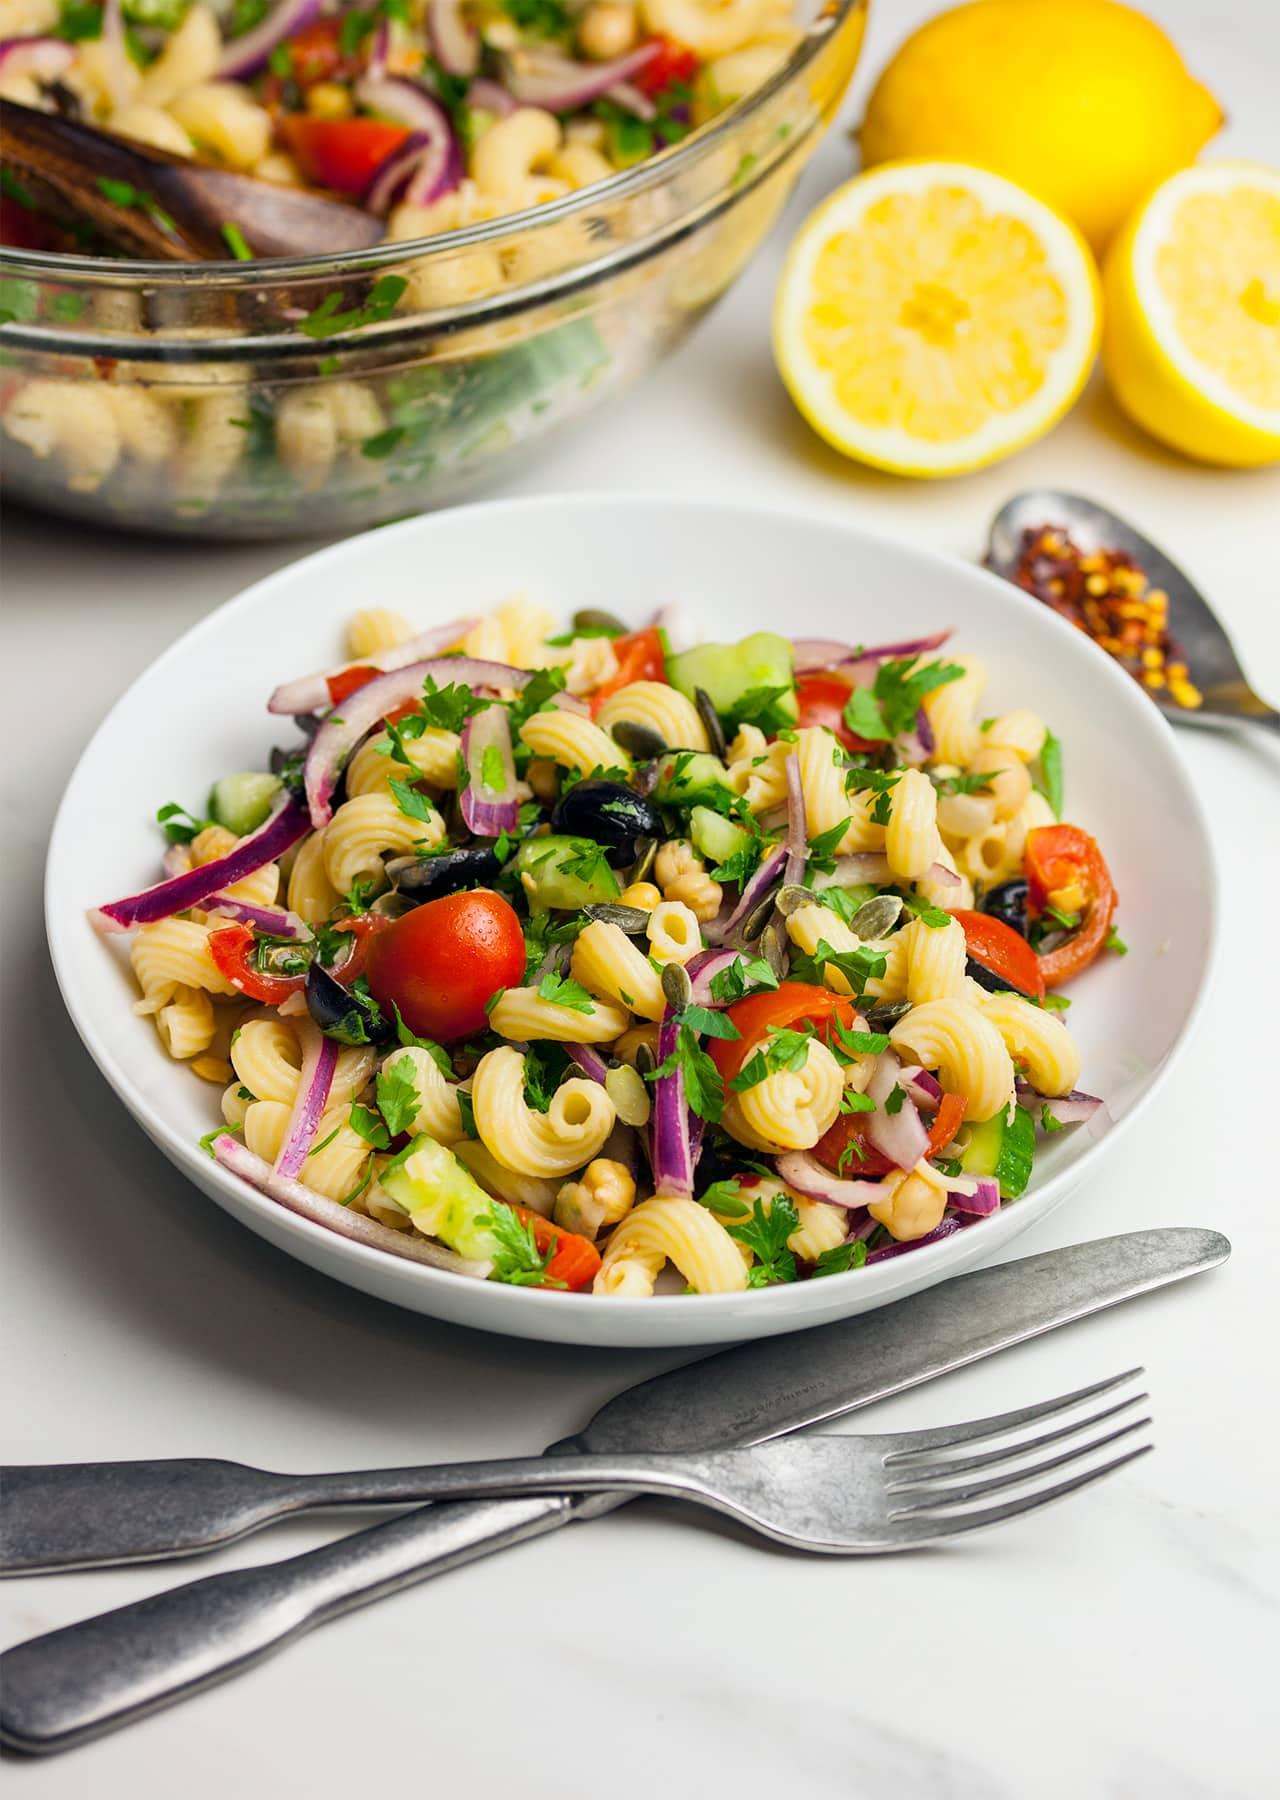 15 Minute Pasta Salad